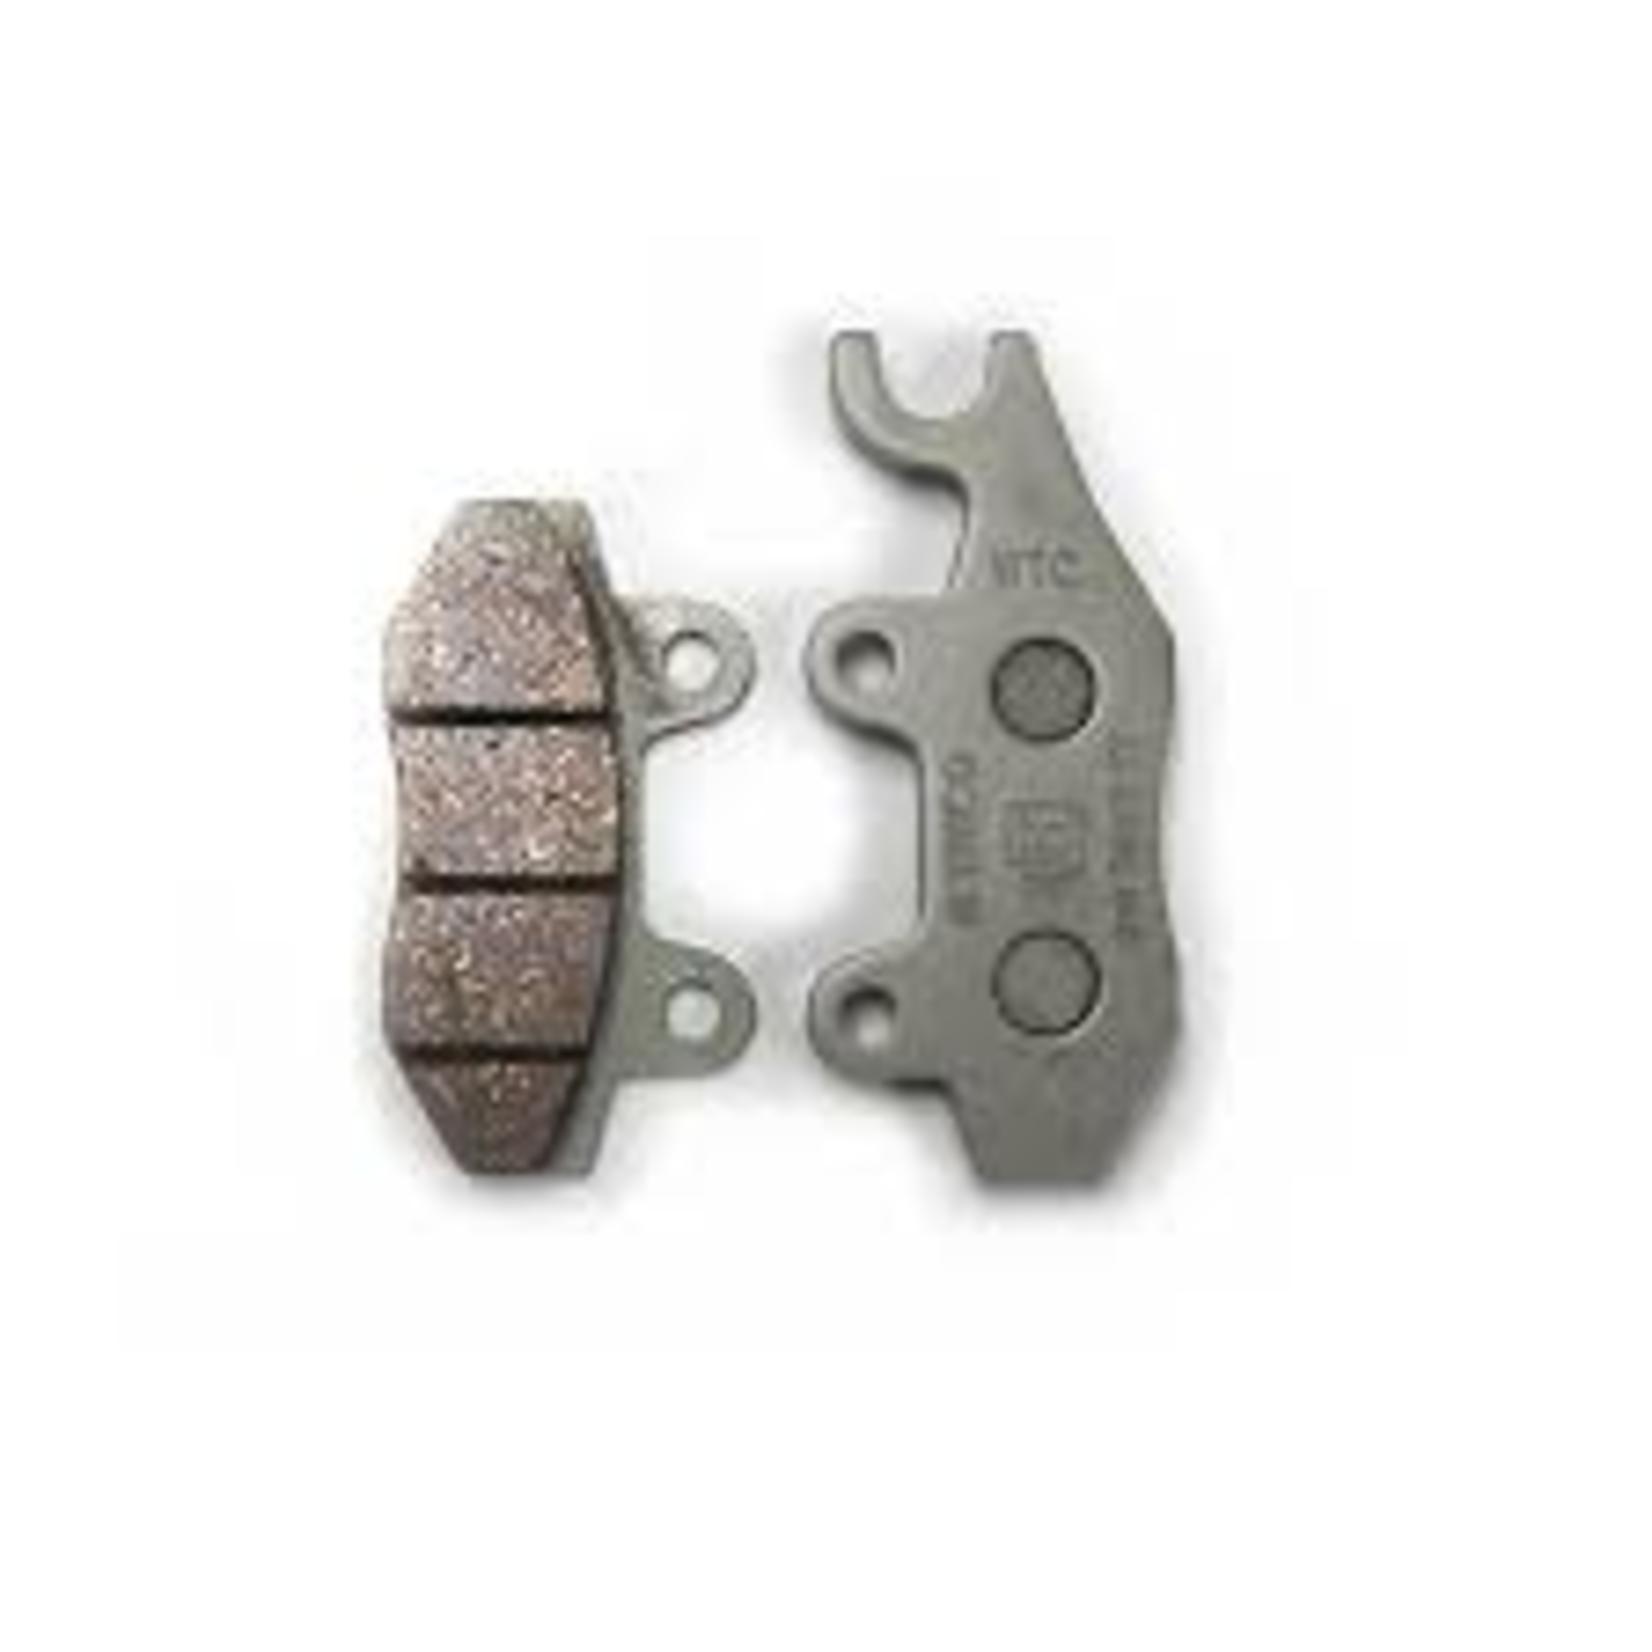 Parts Brake Pads, Front  (GT GTS GTV GT60 GT Super BV250 Fly50 Fly150, Primavera, MP3400/500 rear (497116)